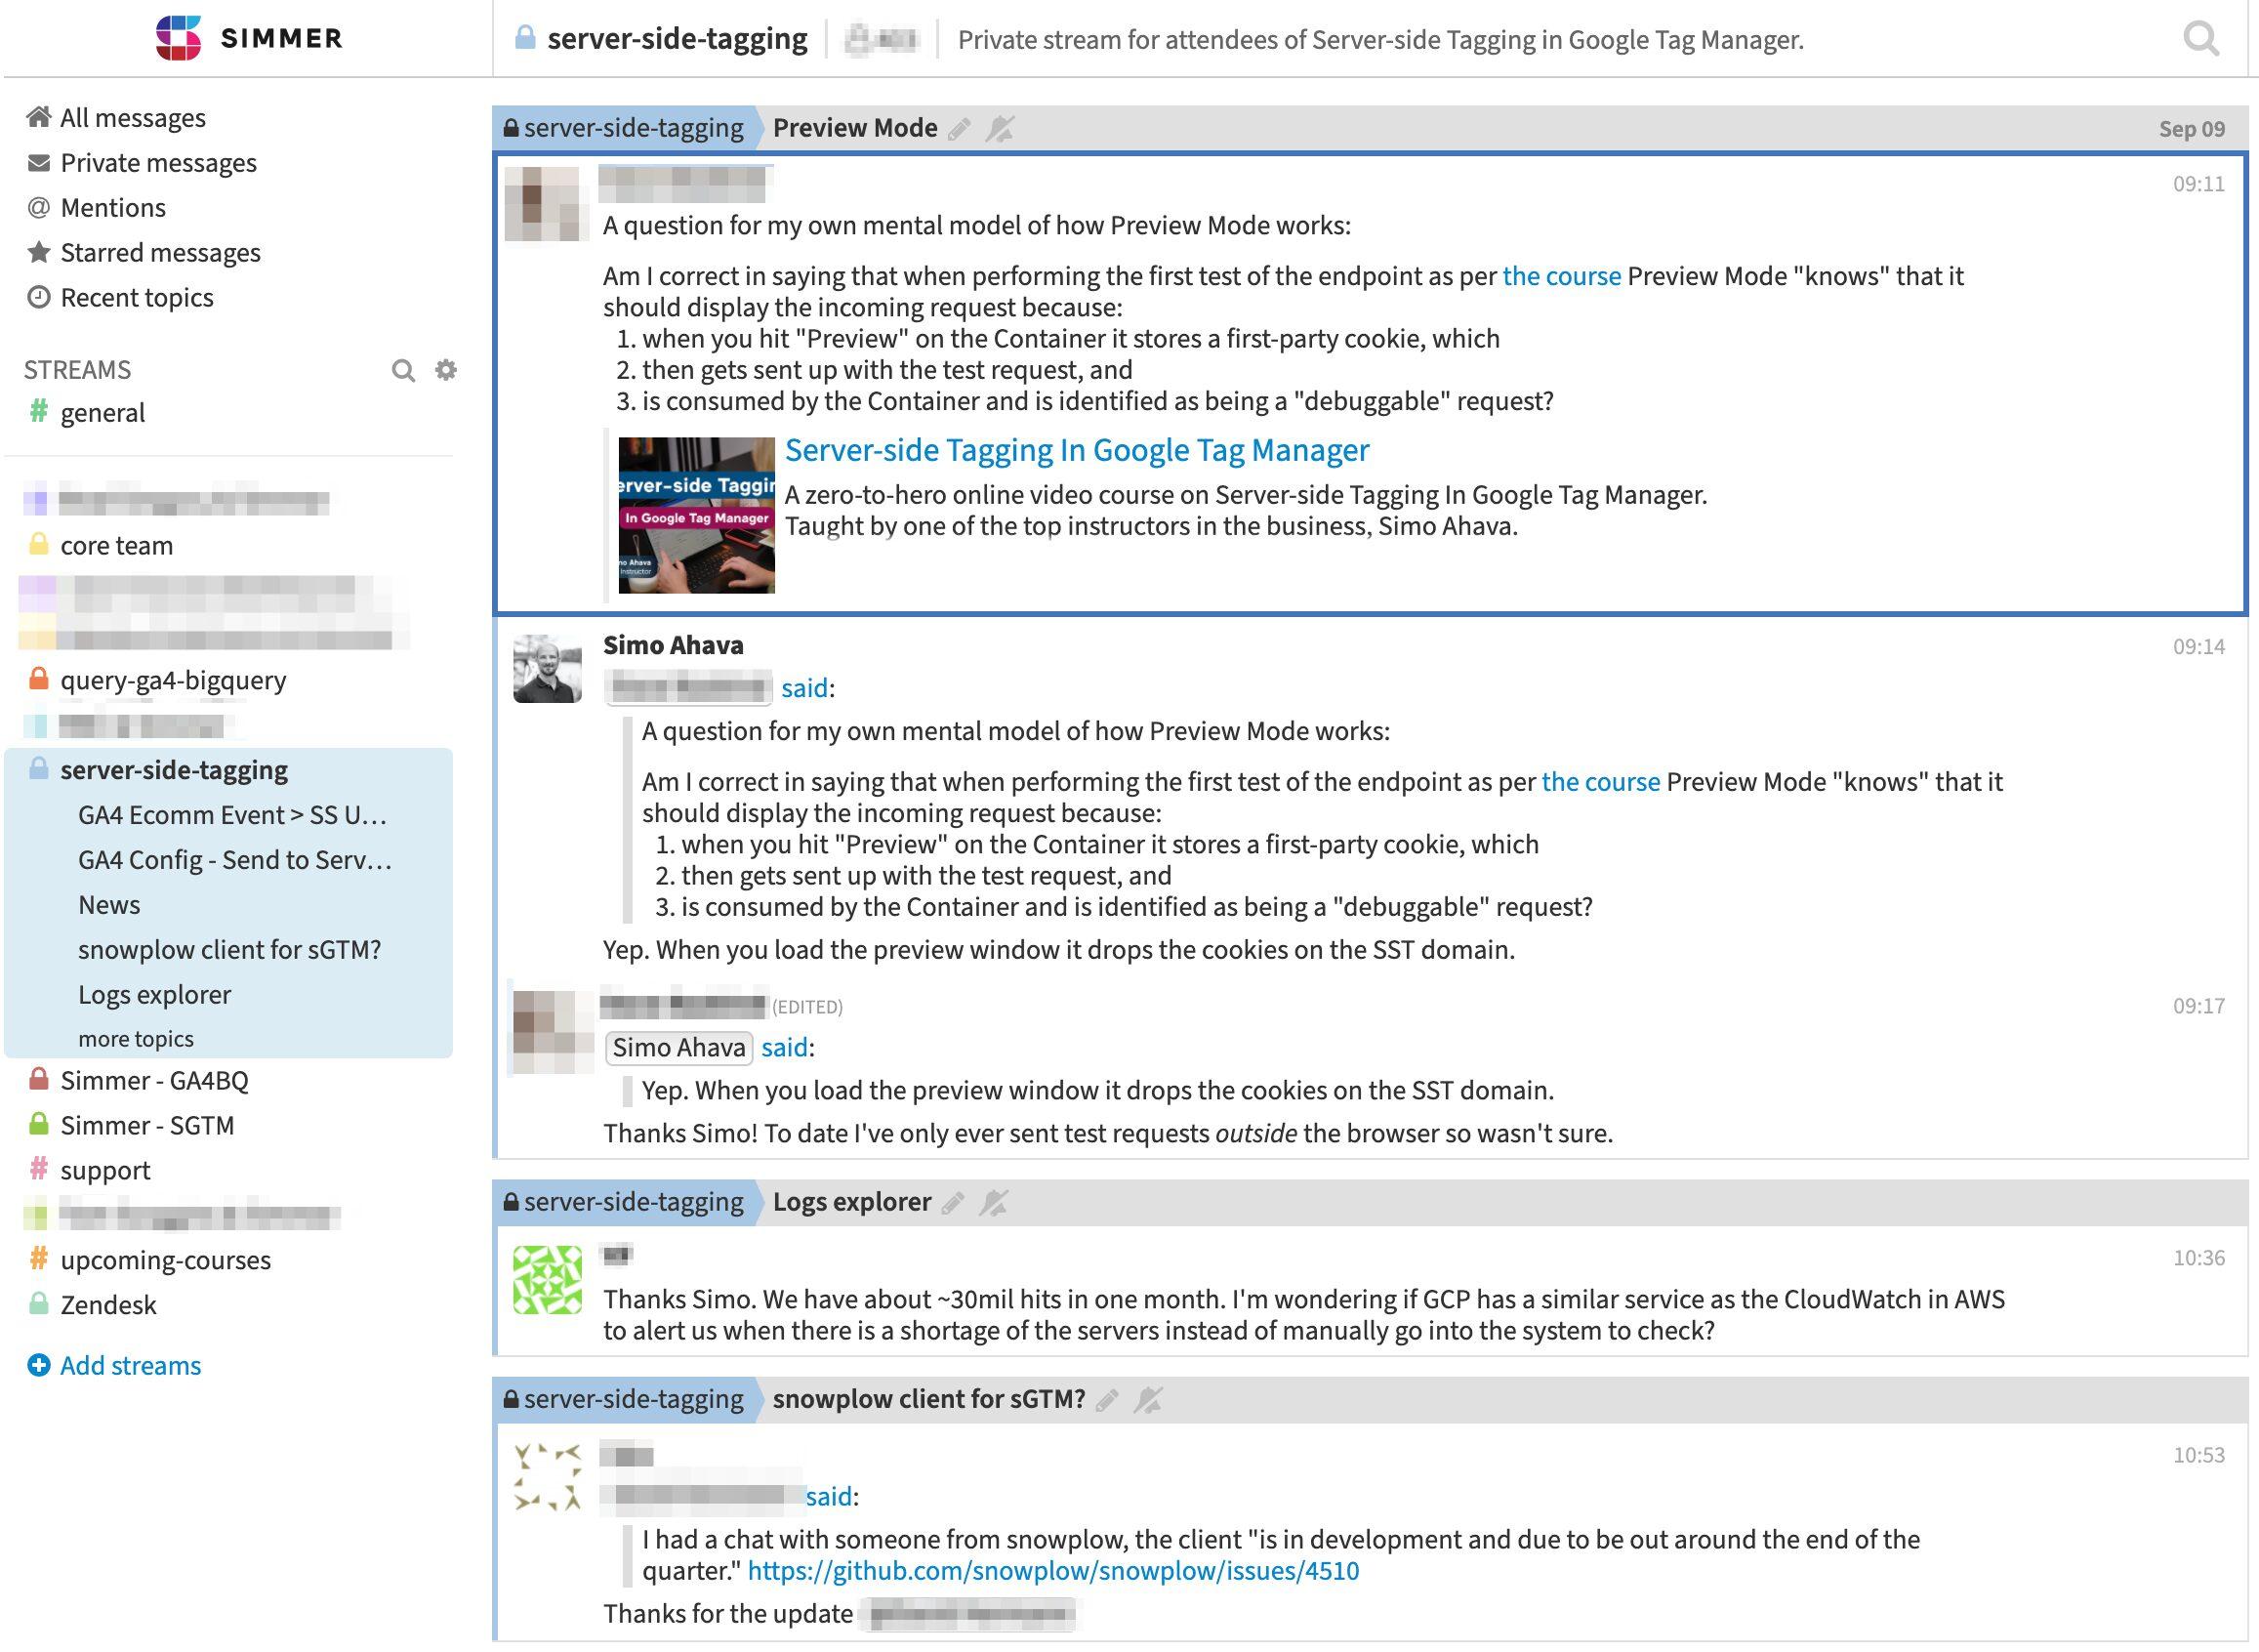 Simmer community server-side tagging